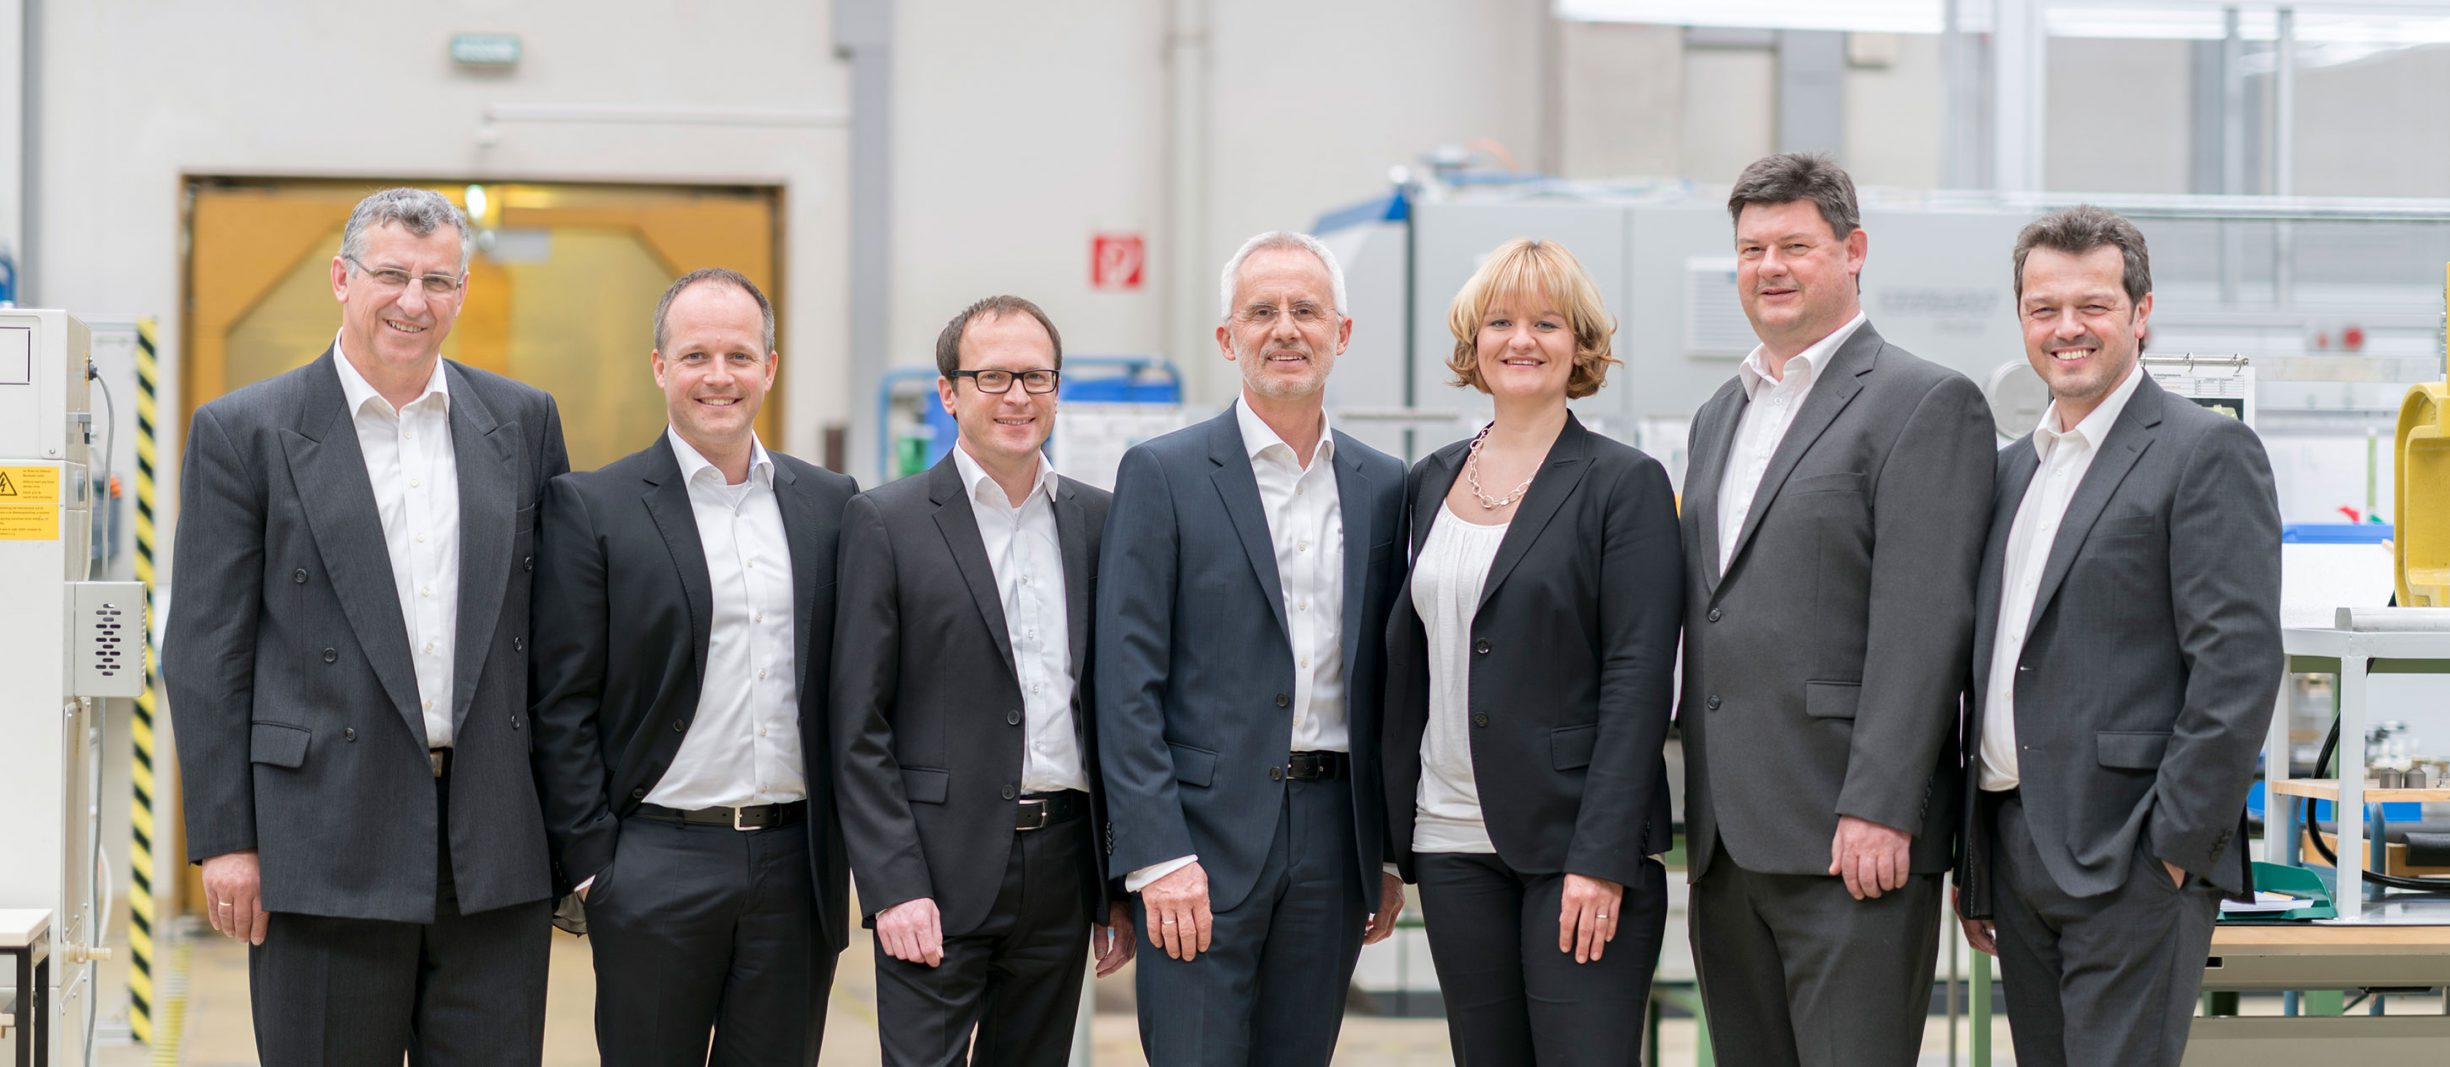 EME Elektro-Metall Company Management Team